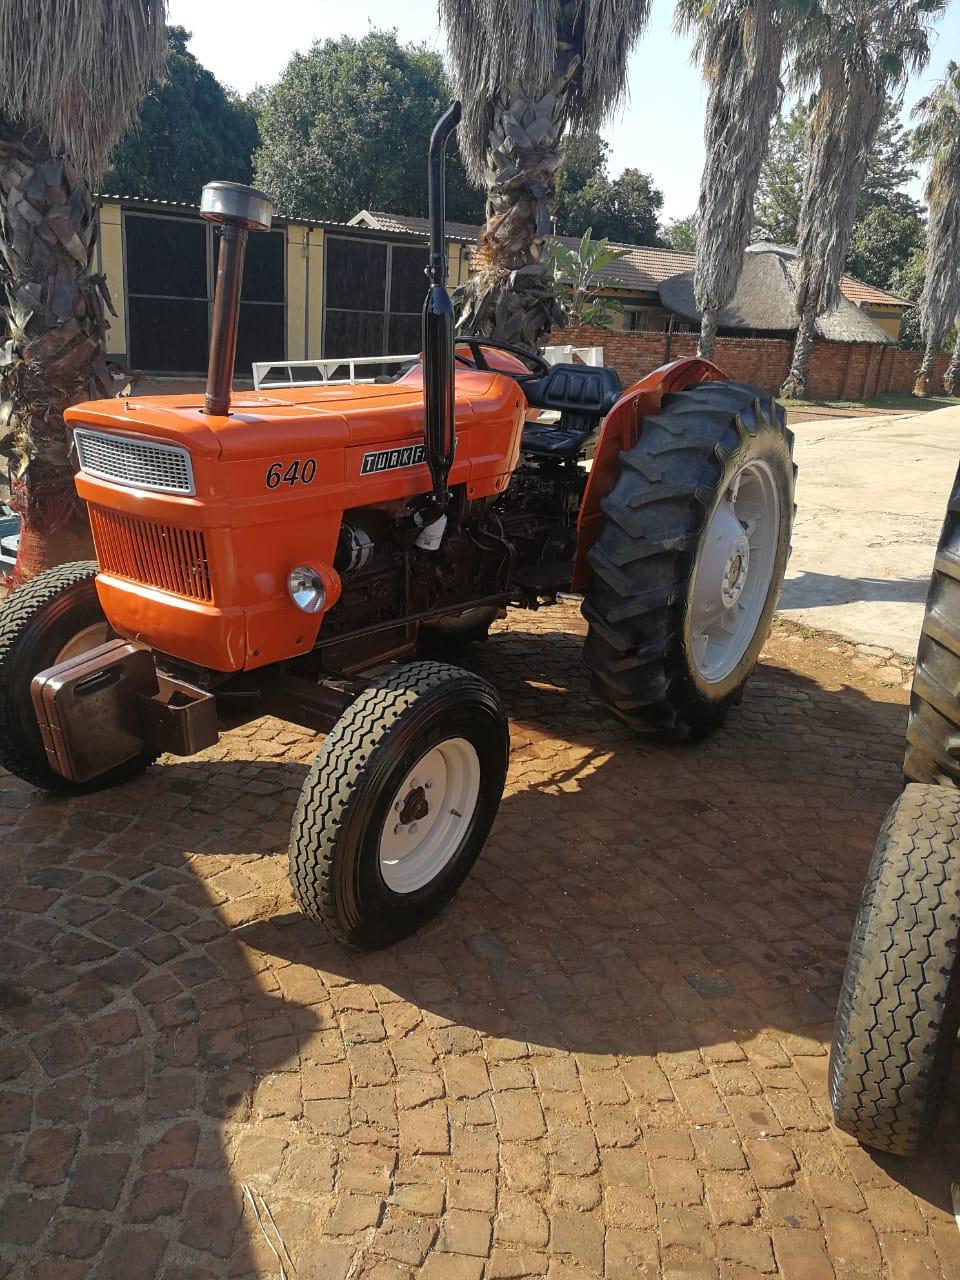 Fiat 640 tractor